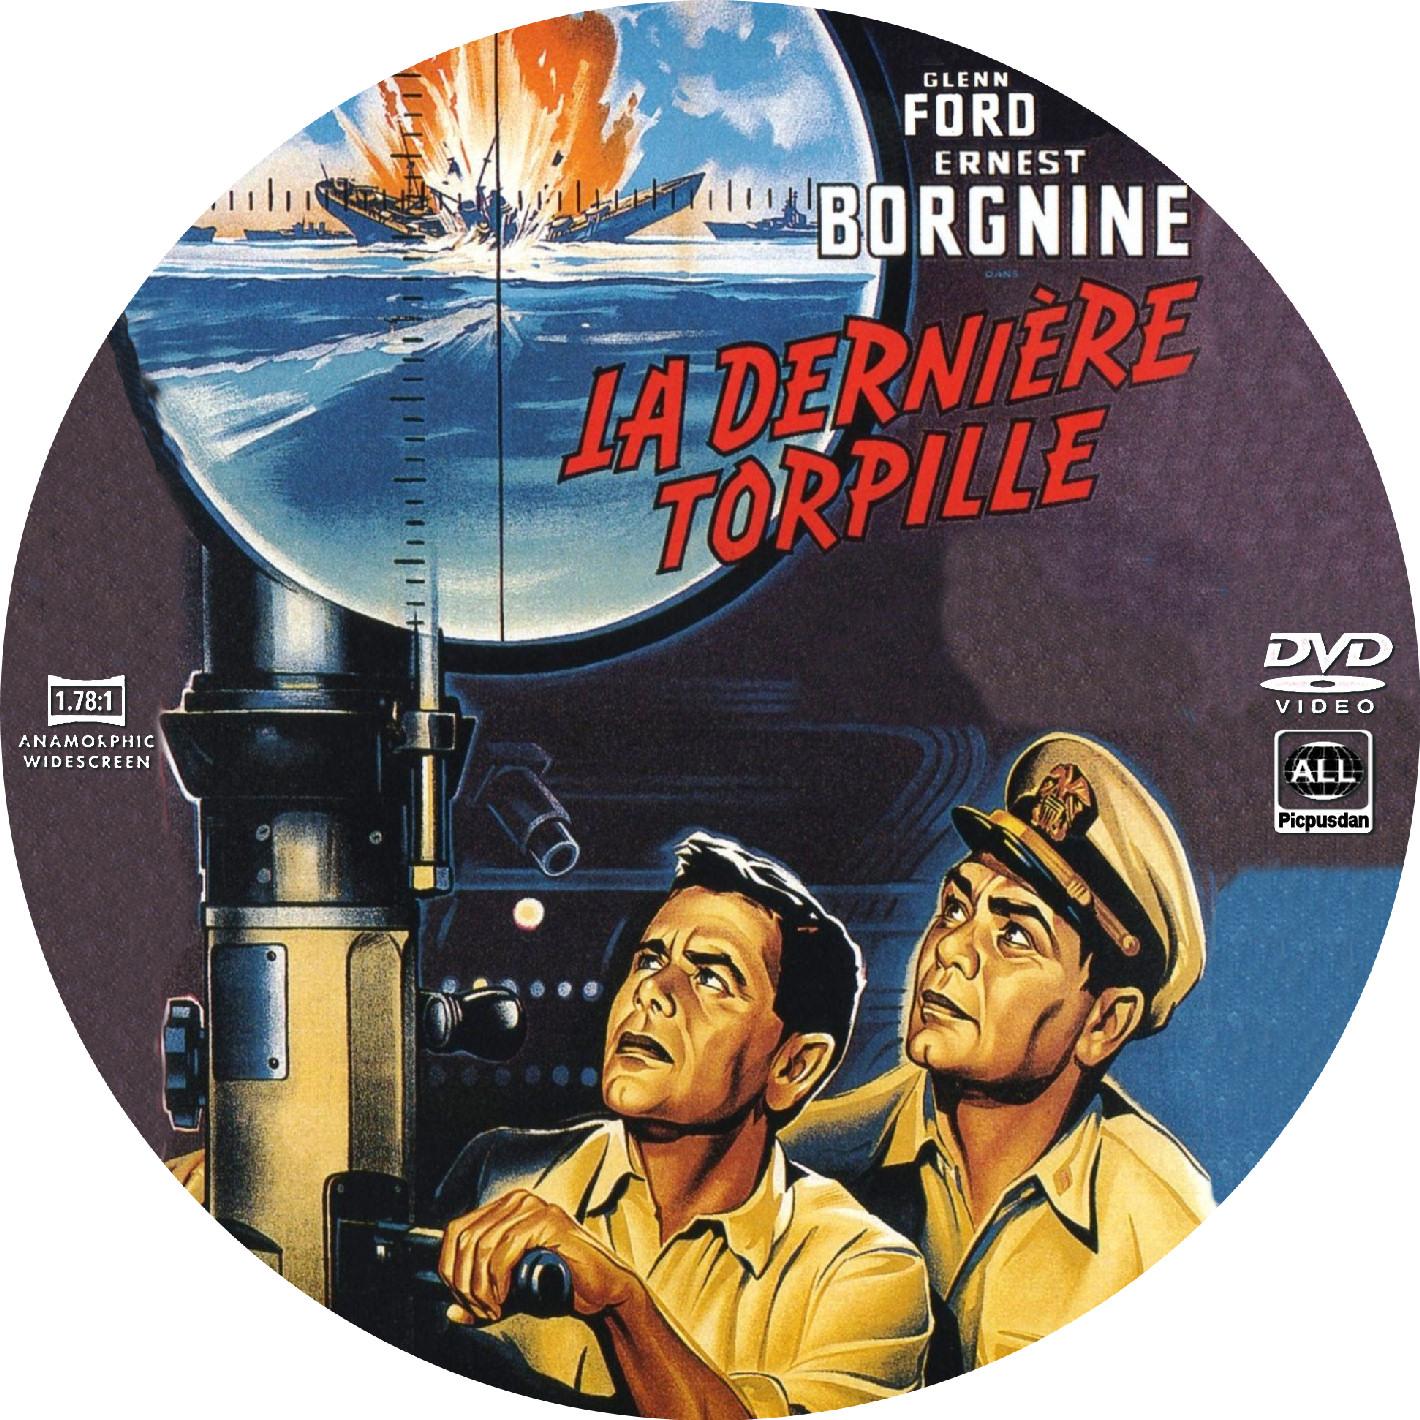 la derniere torpille ( Torpedo run ) - 1958 - Joseph Pevney La%20derniere%20torpilled